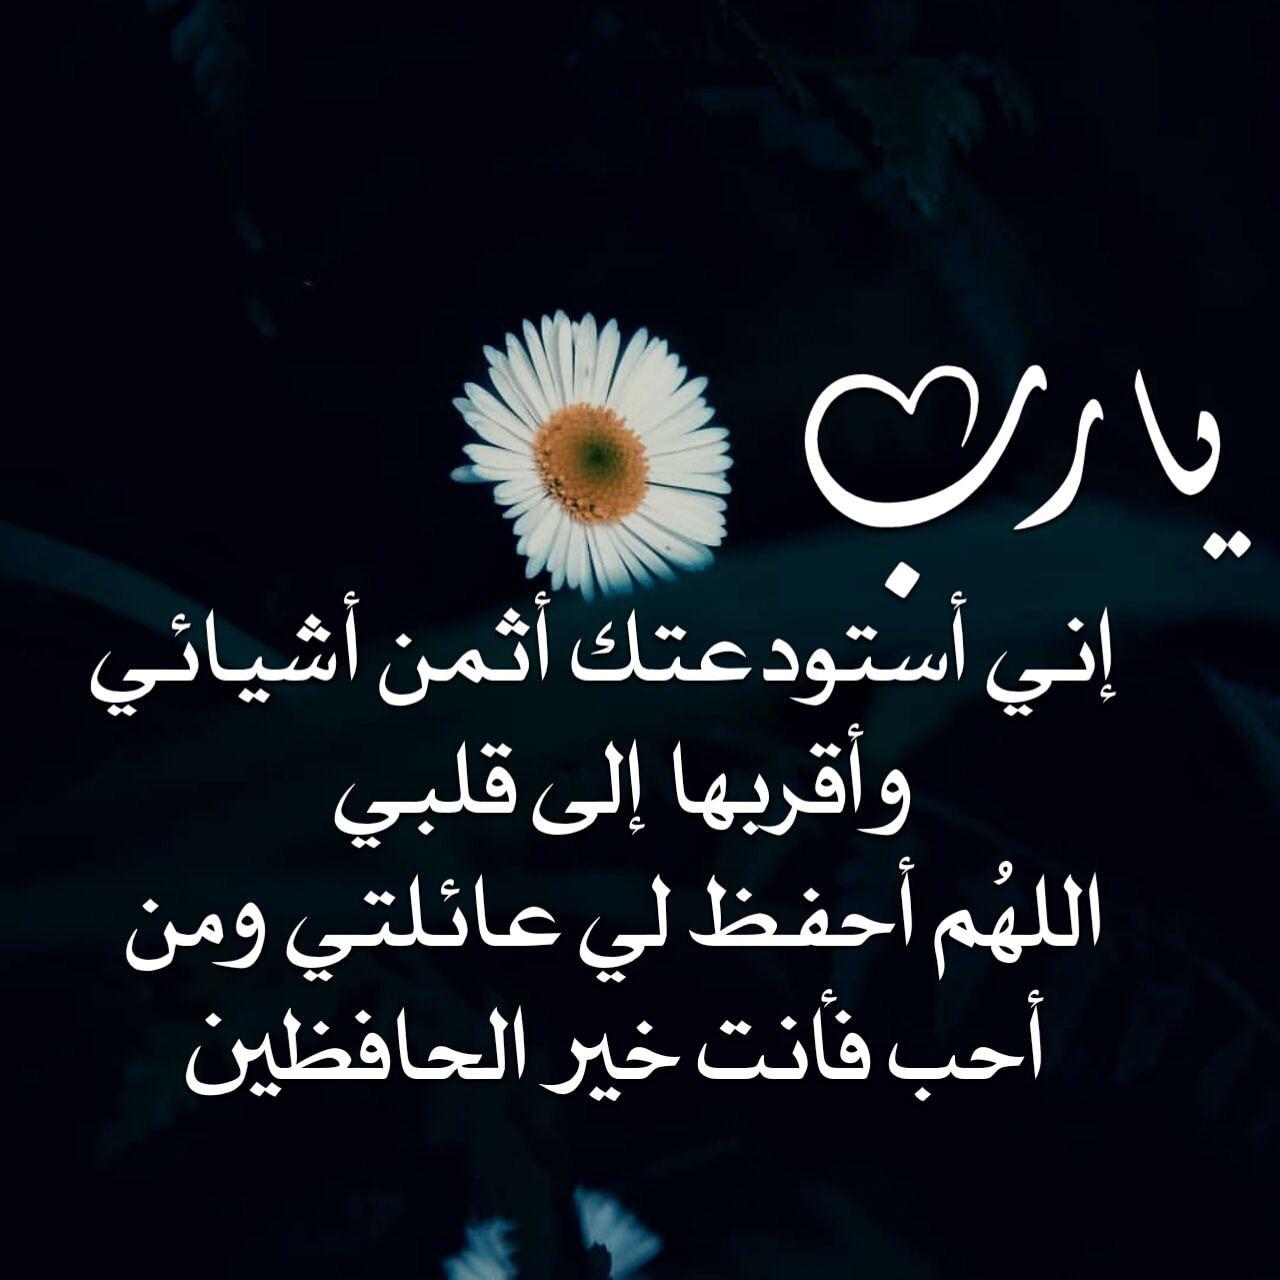 Pin By بنت محمد On يارب Allah Islam Islam Calligraphy